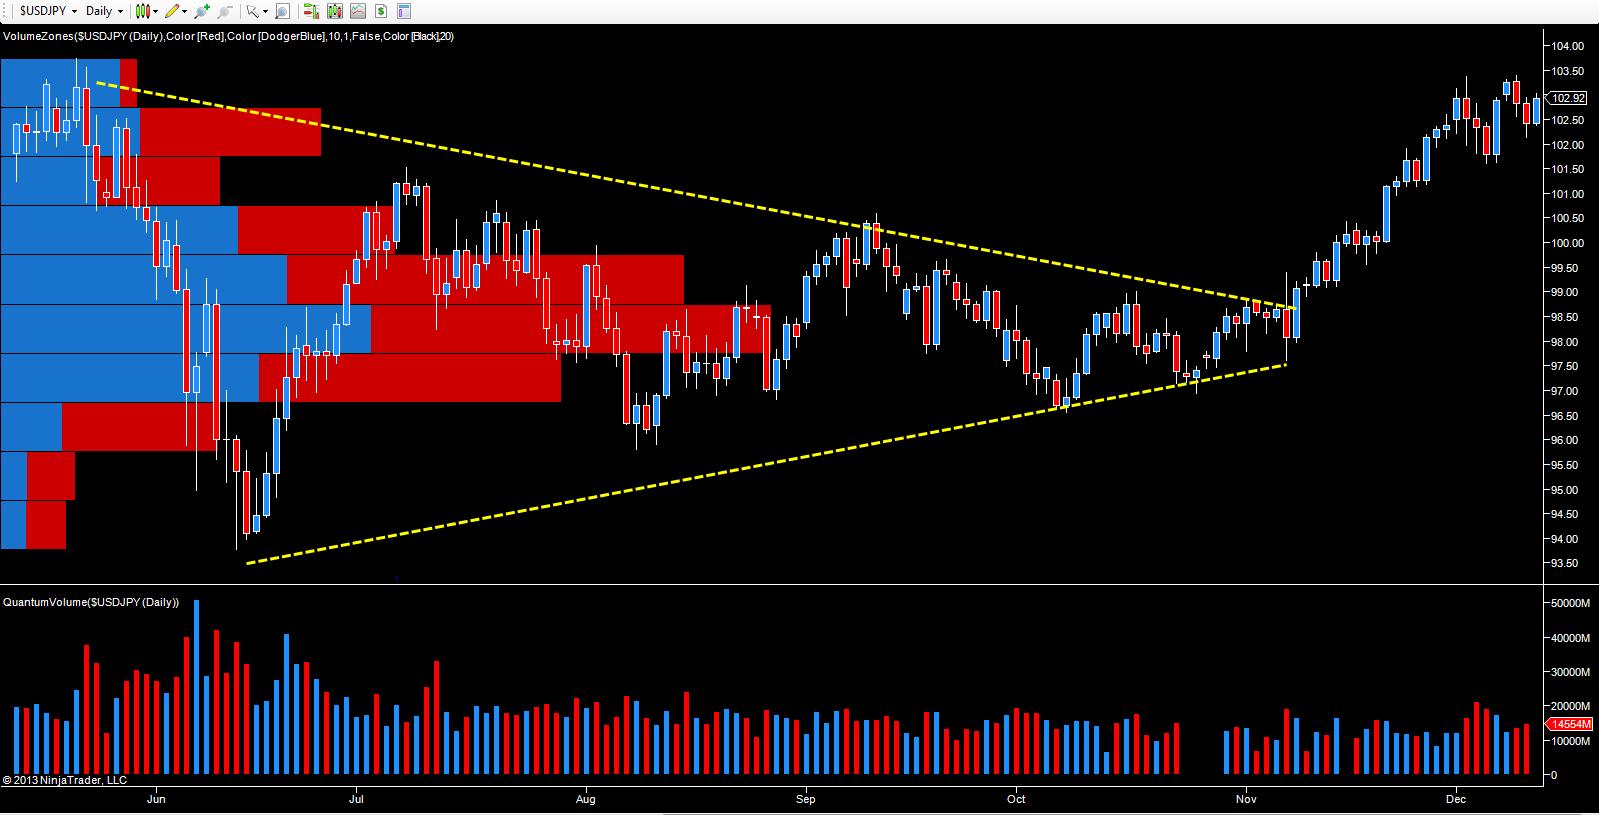 USD/JPY - daily chart